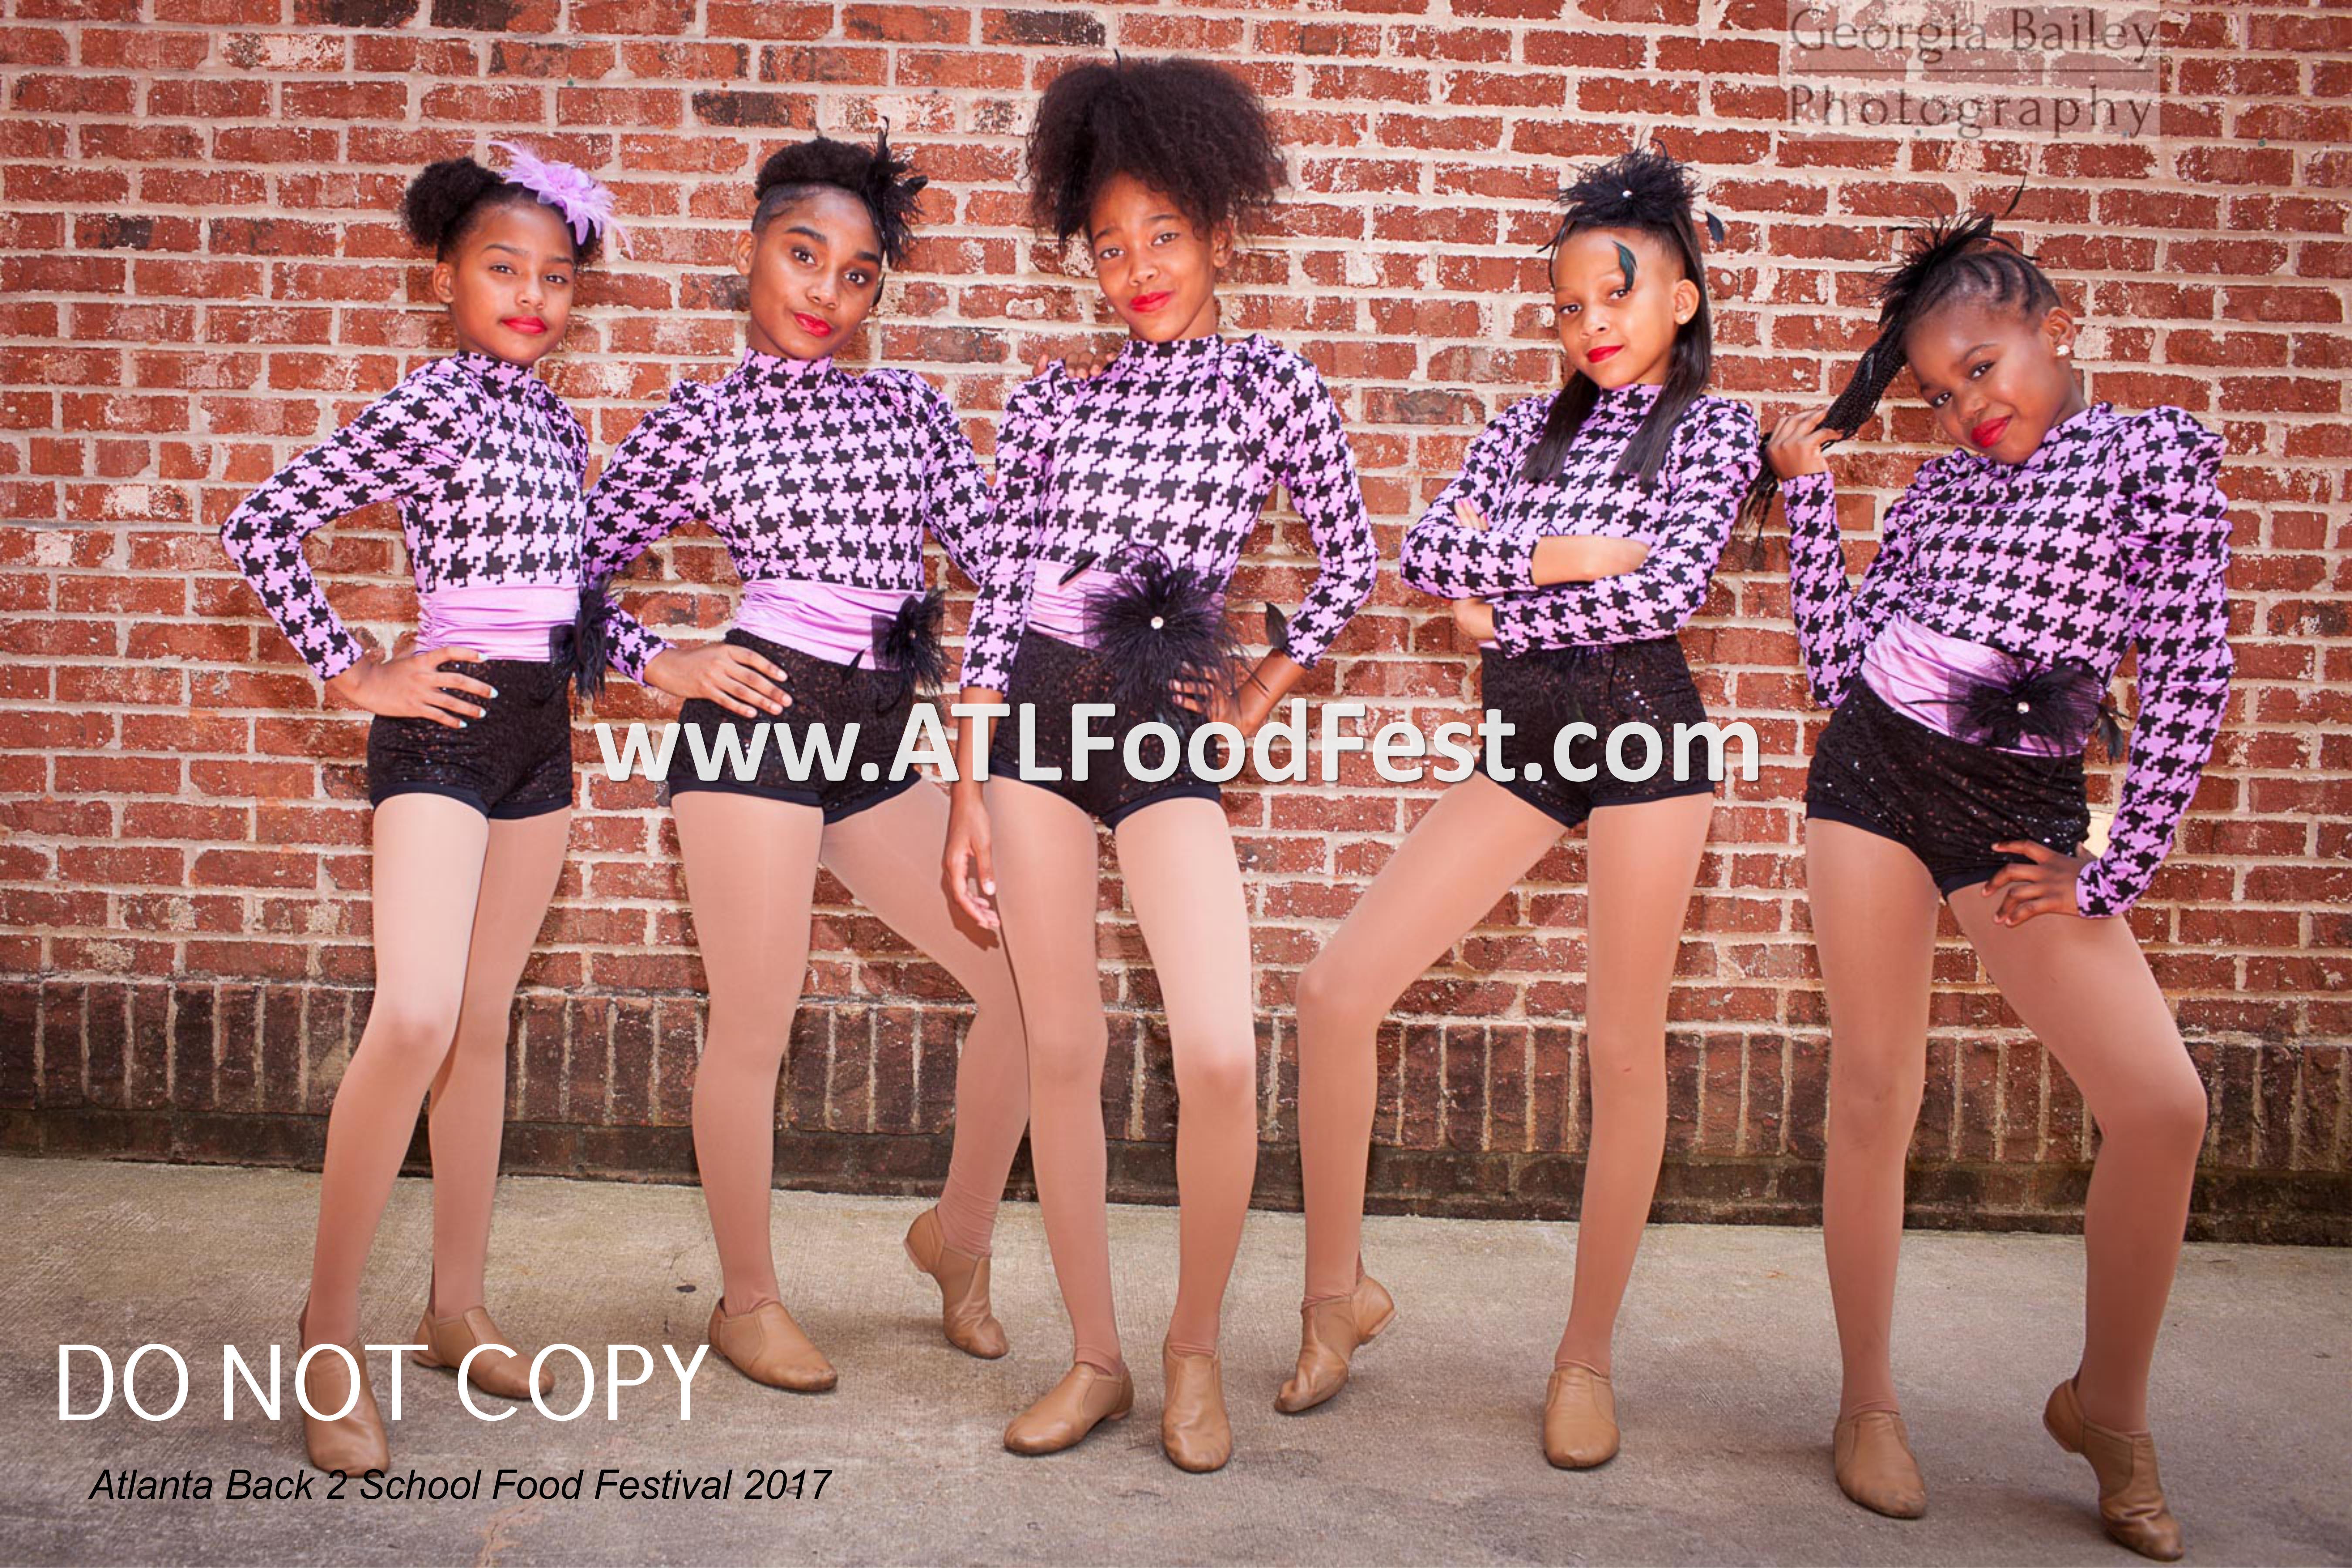 Atlanta Back 2 School Kids Dance